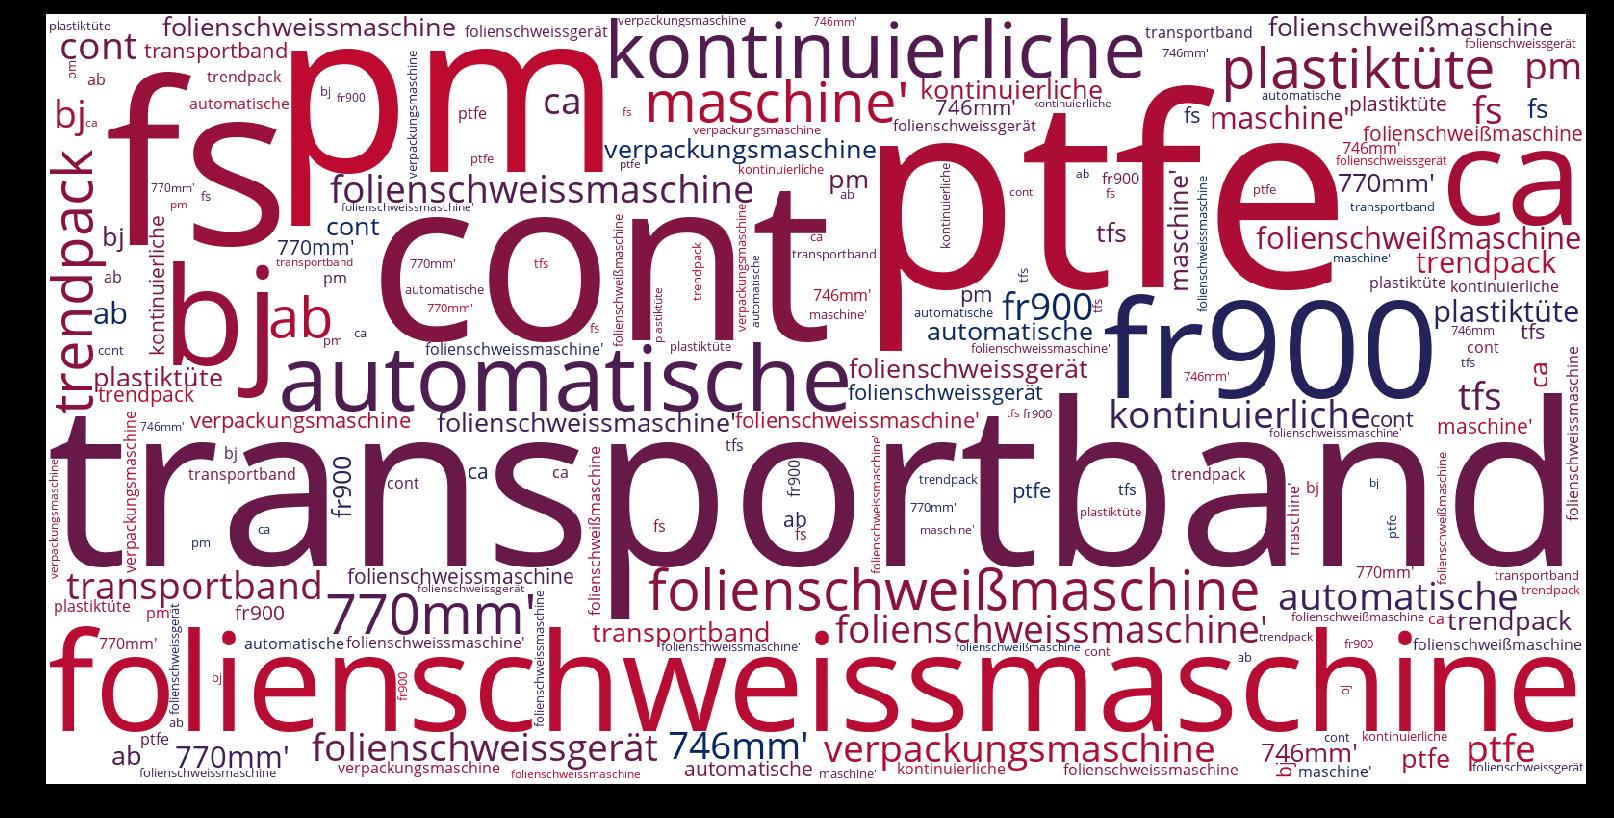 Folienschweissmaschine-wordcloud